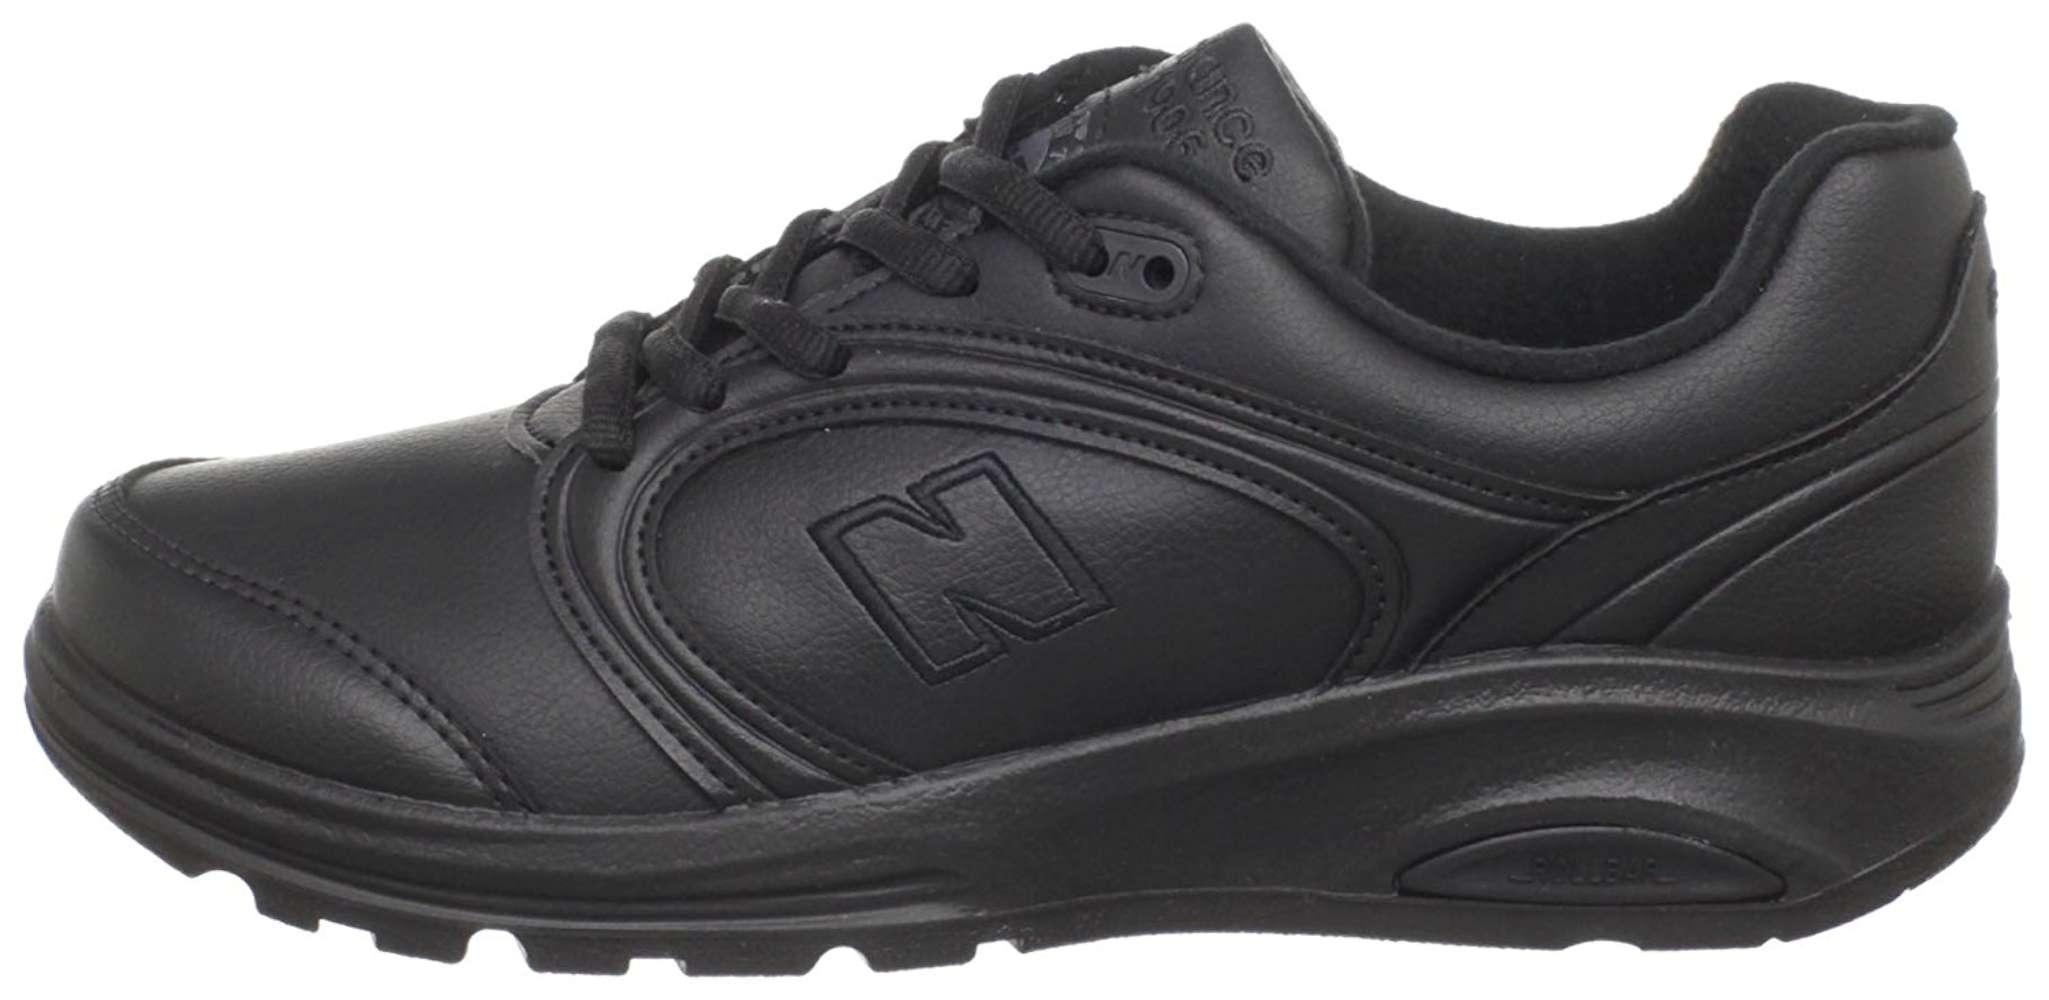 Low Top Lace Up Walking Shoes, Black